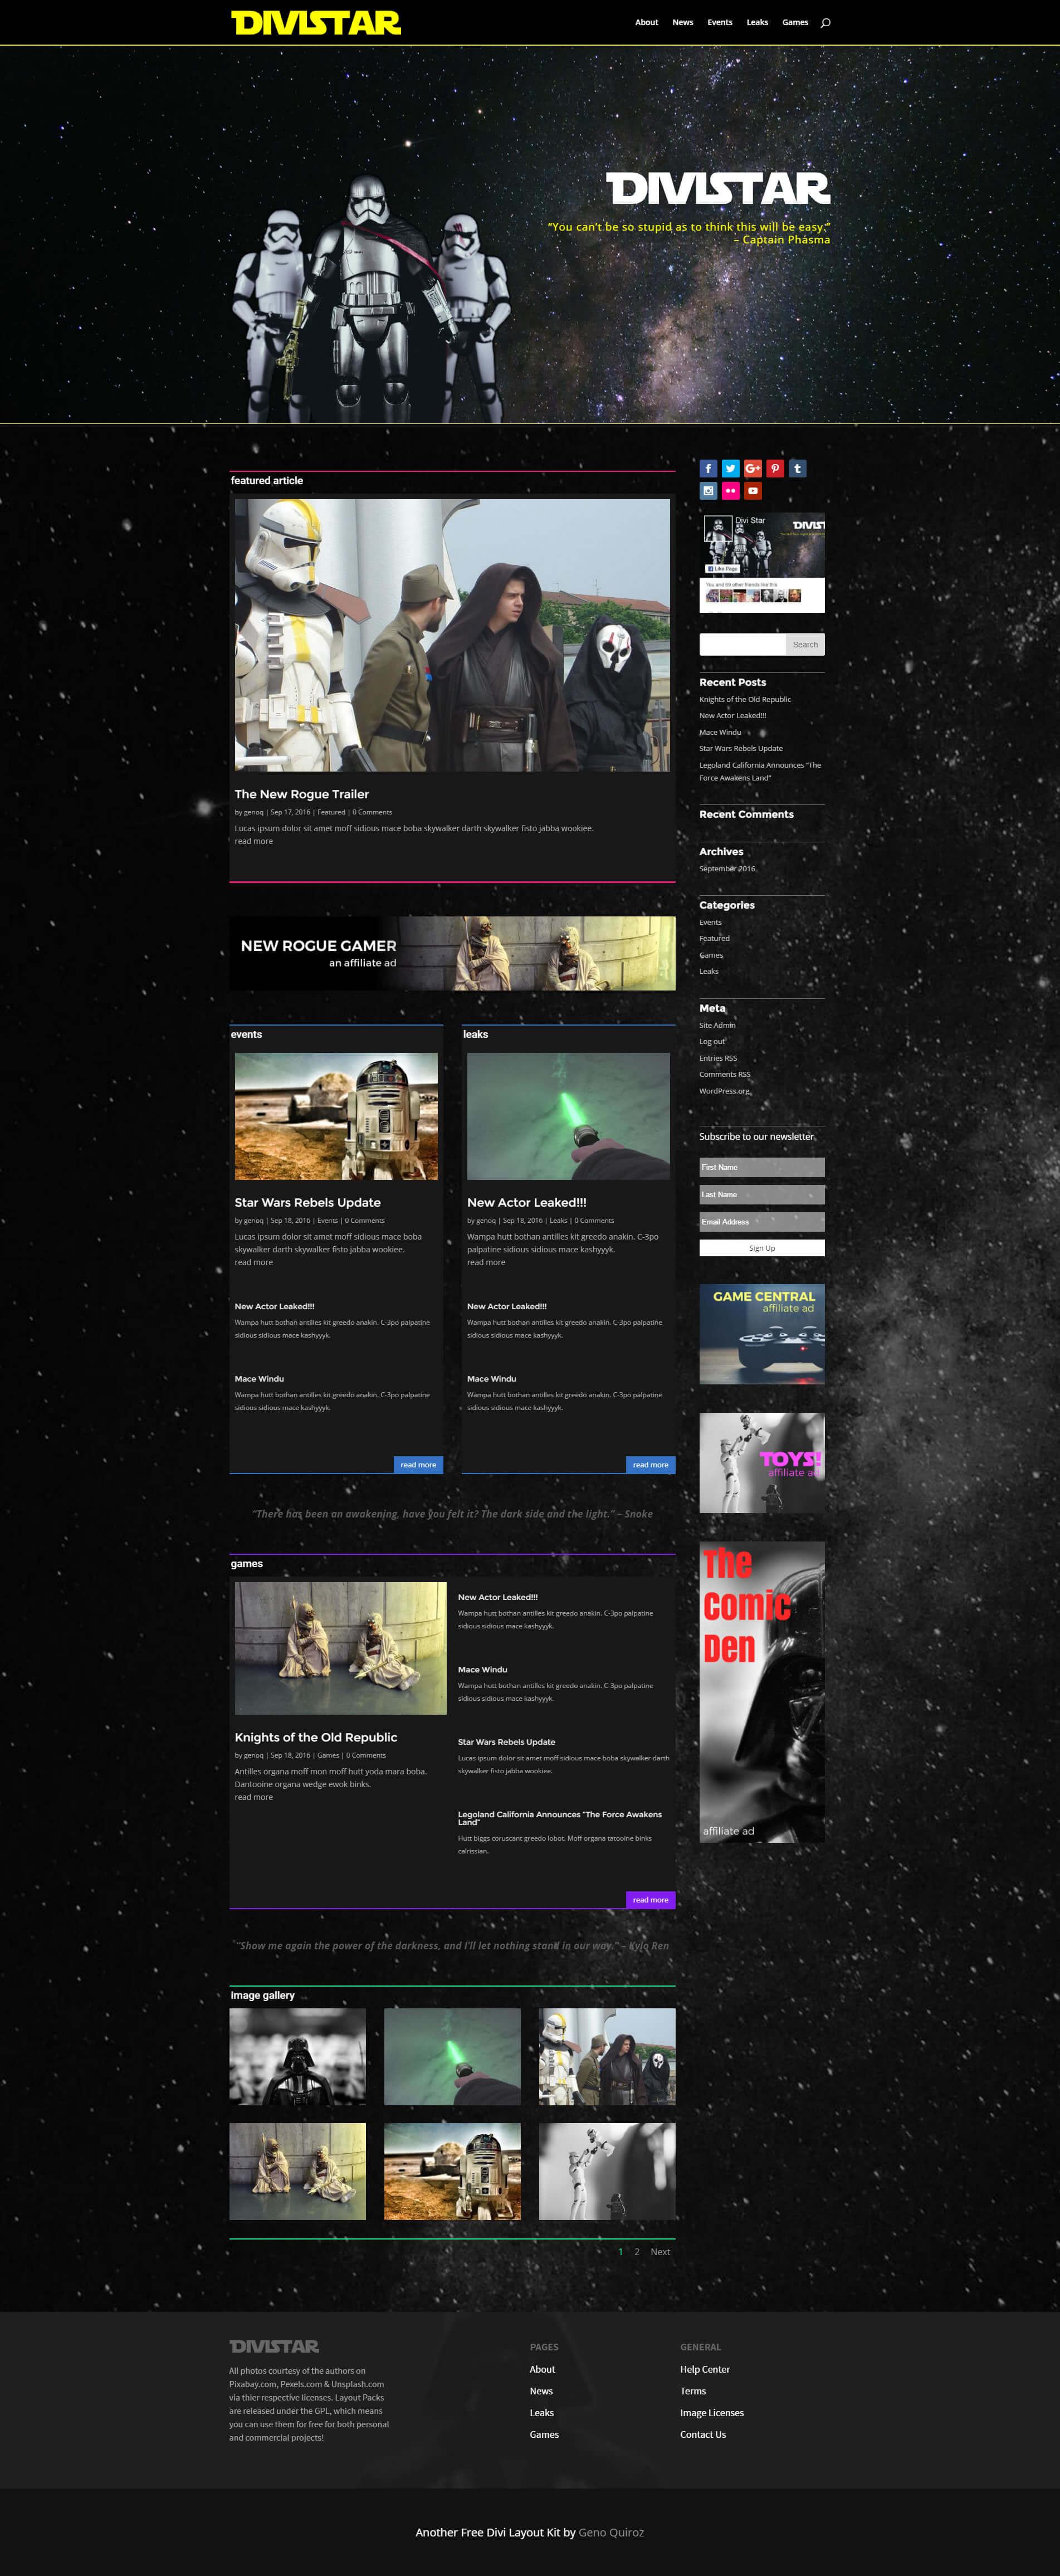 divistar-home-page